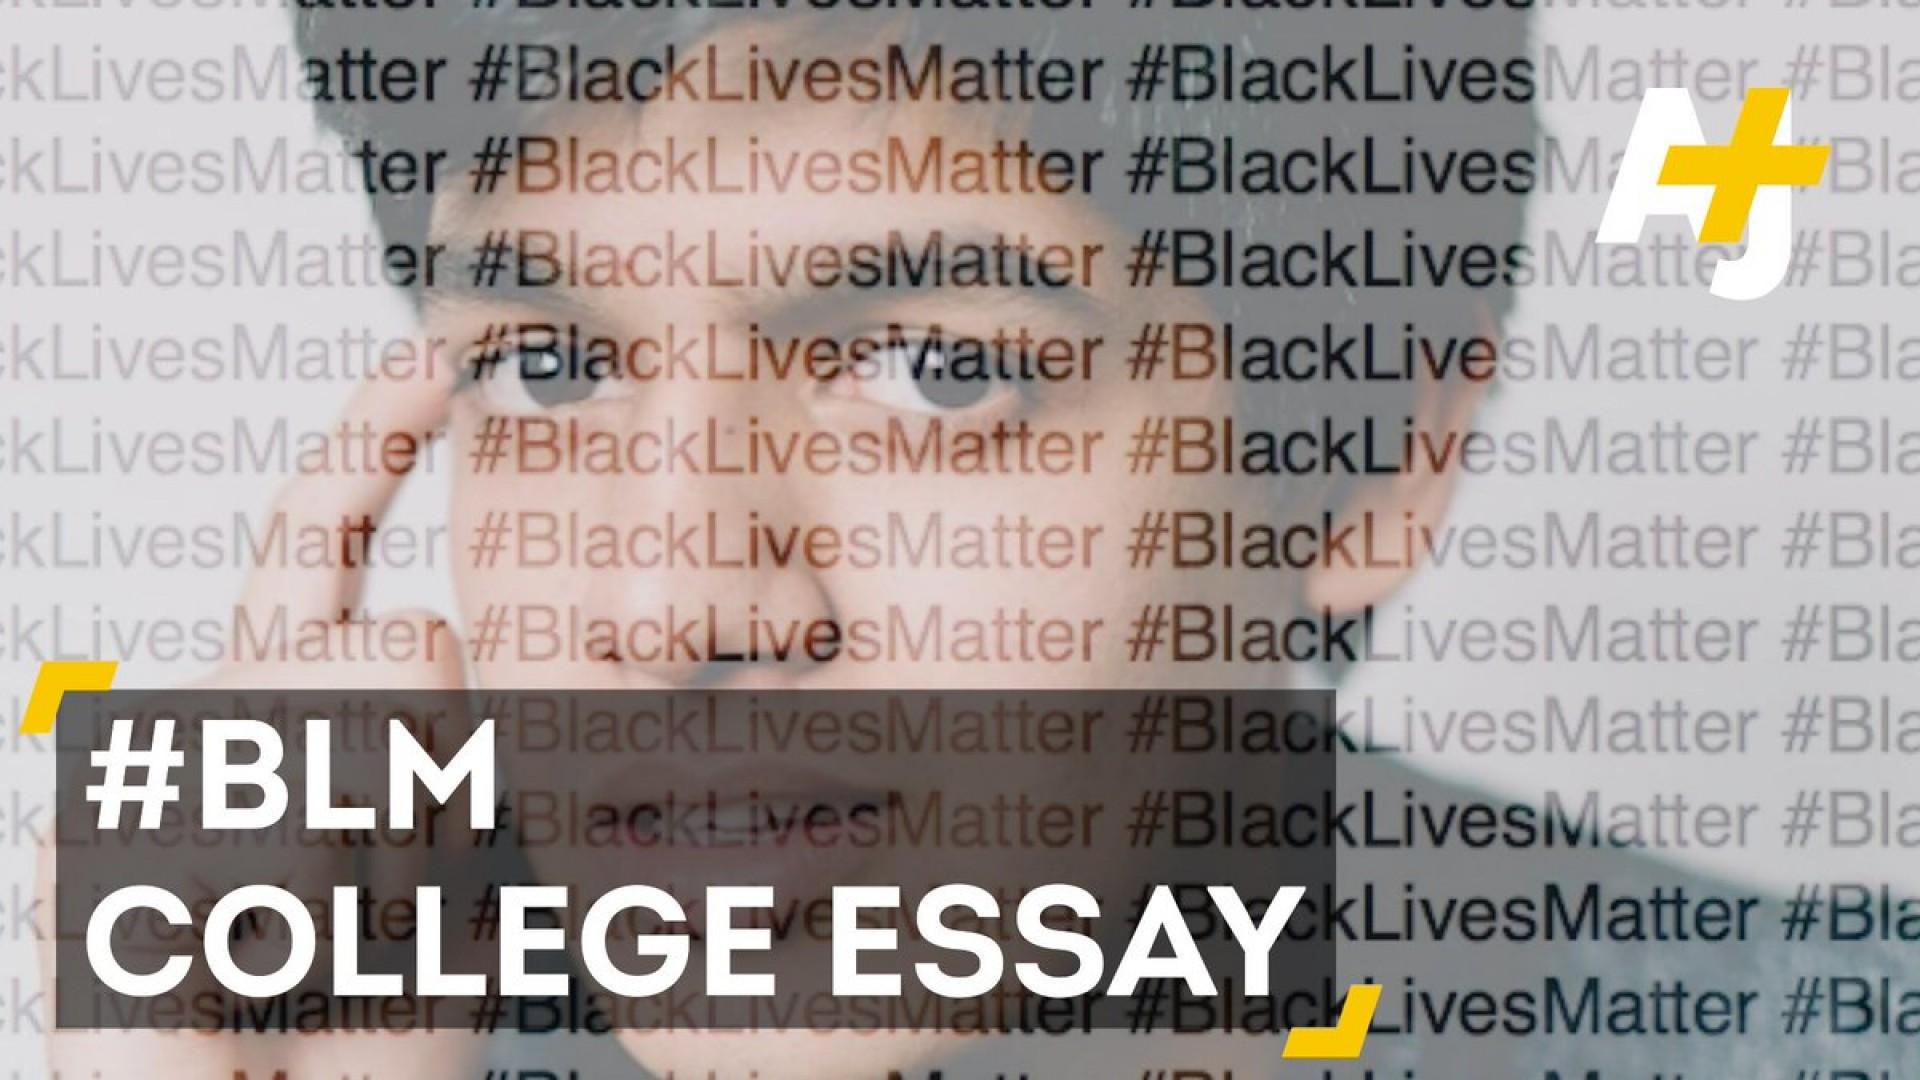 003 C8na7qkwsaaxr K Essay Example Black Lives Matter Wondrous College Stanford 1920